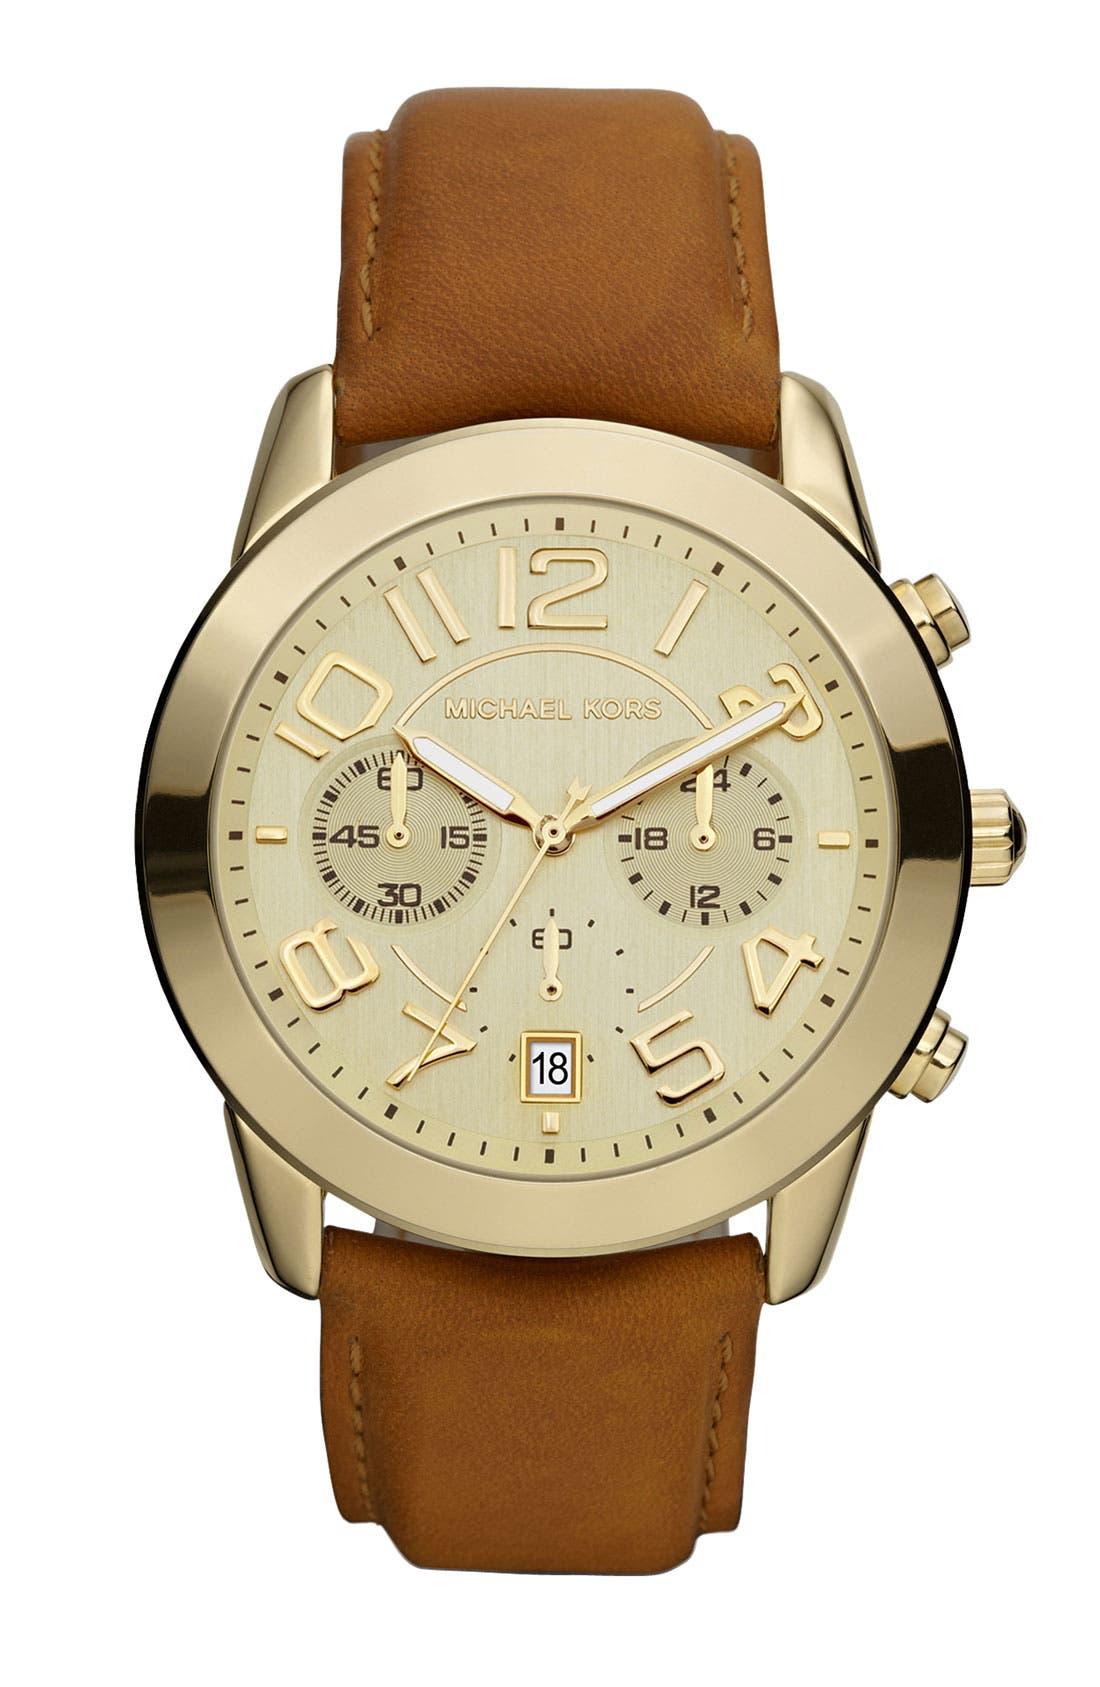 Main Image - Michael Kors Chronograph Leather Strap Watch, 41mm